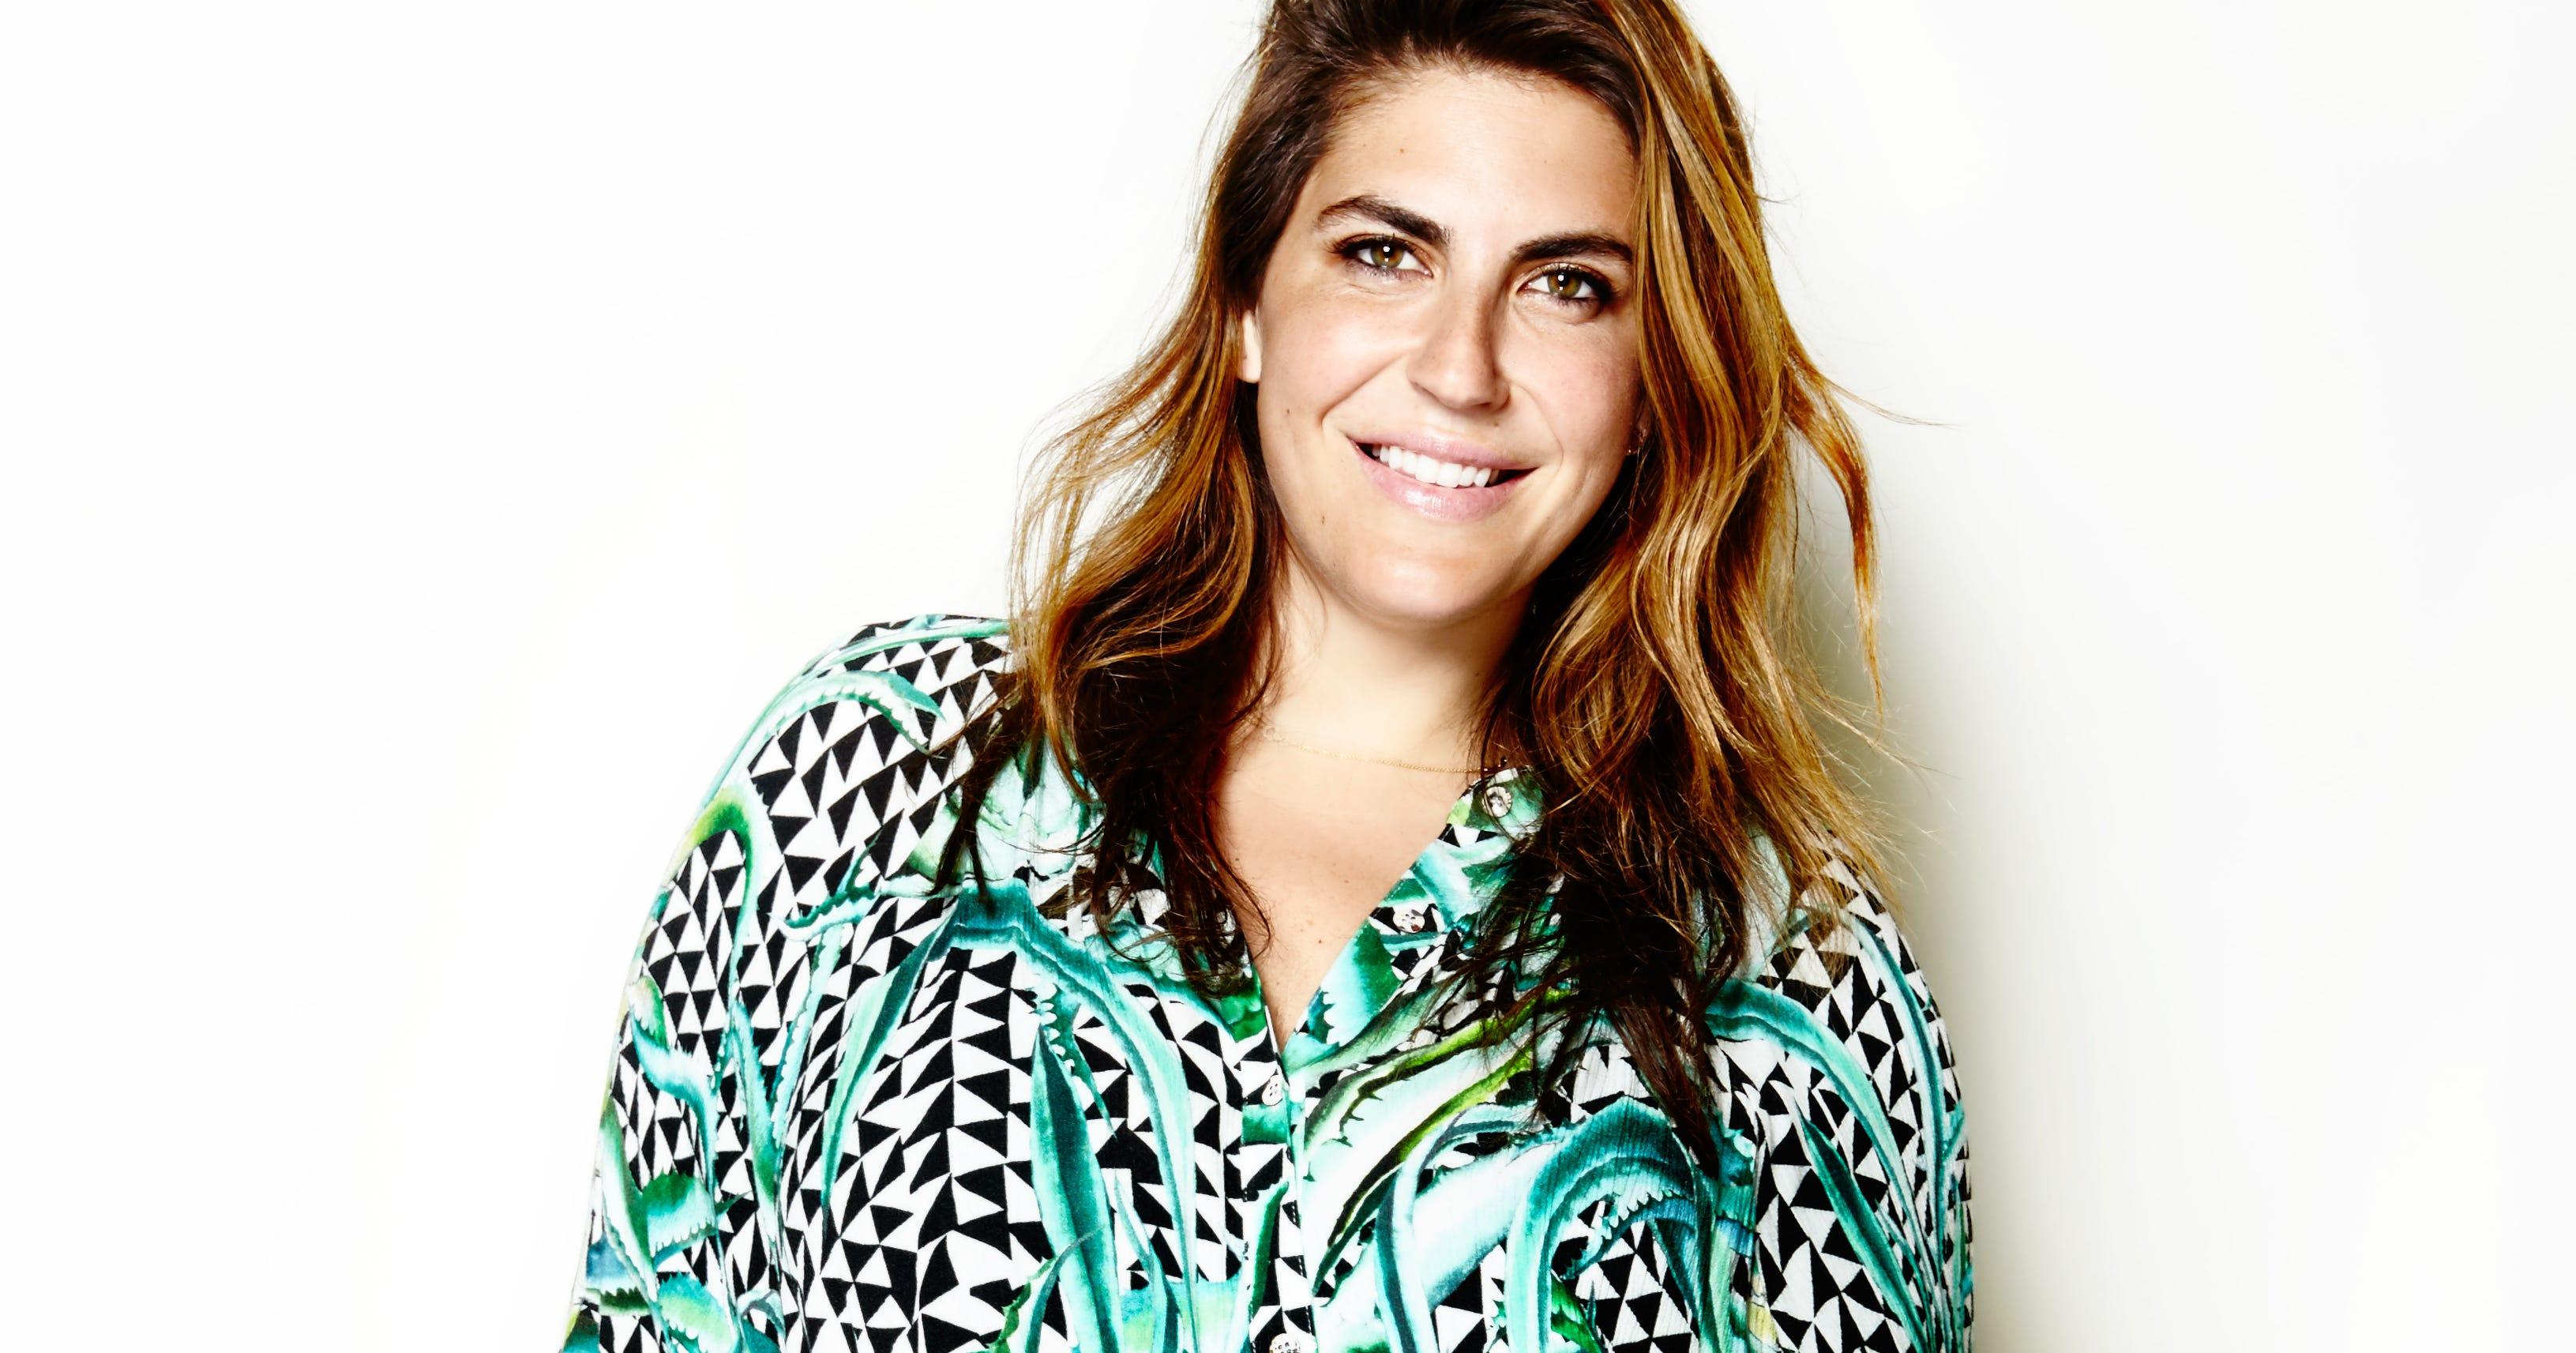 Katie Sturino Body Positivity Fashion Personal Essay